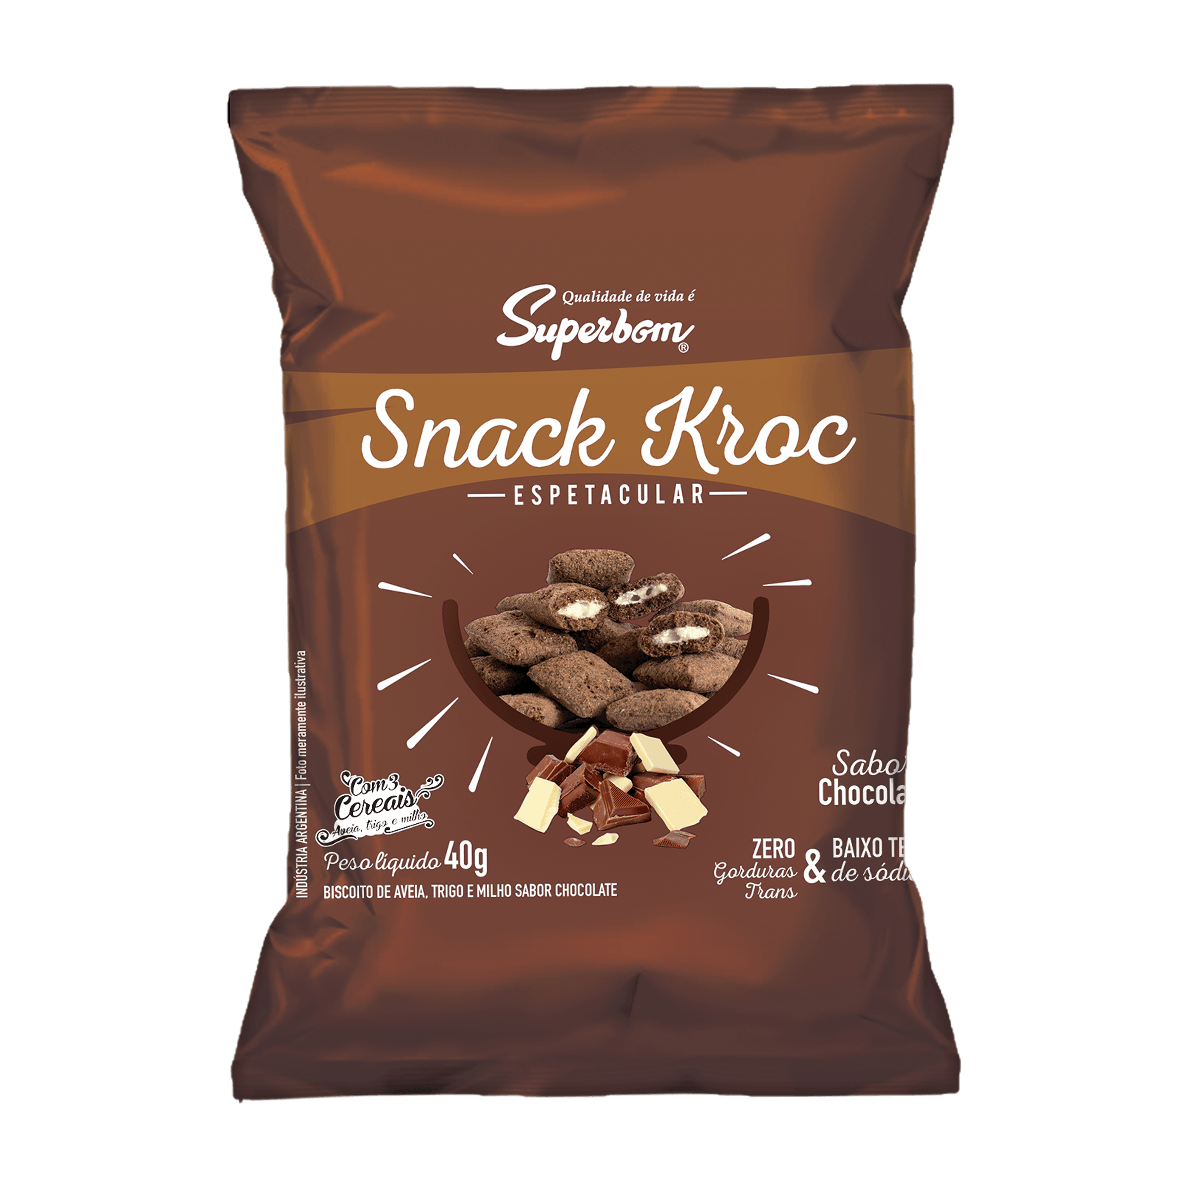 Snack_Kroc_Chocolate